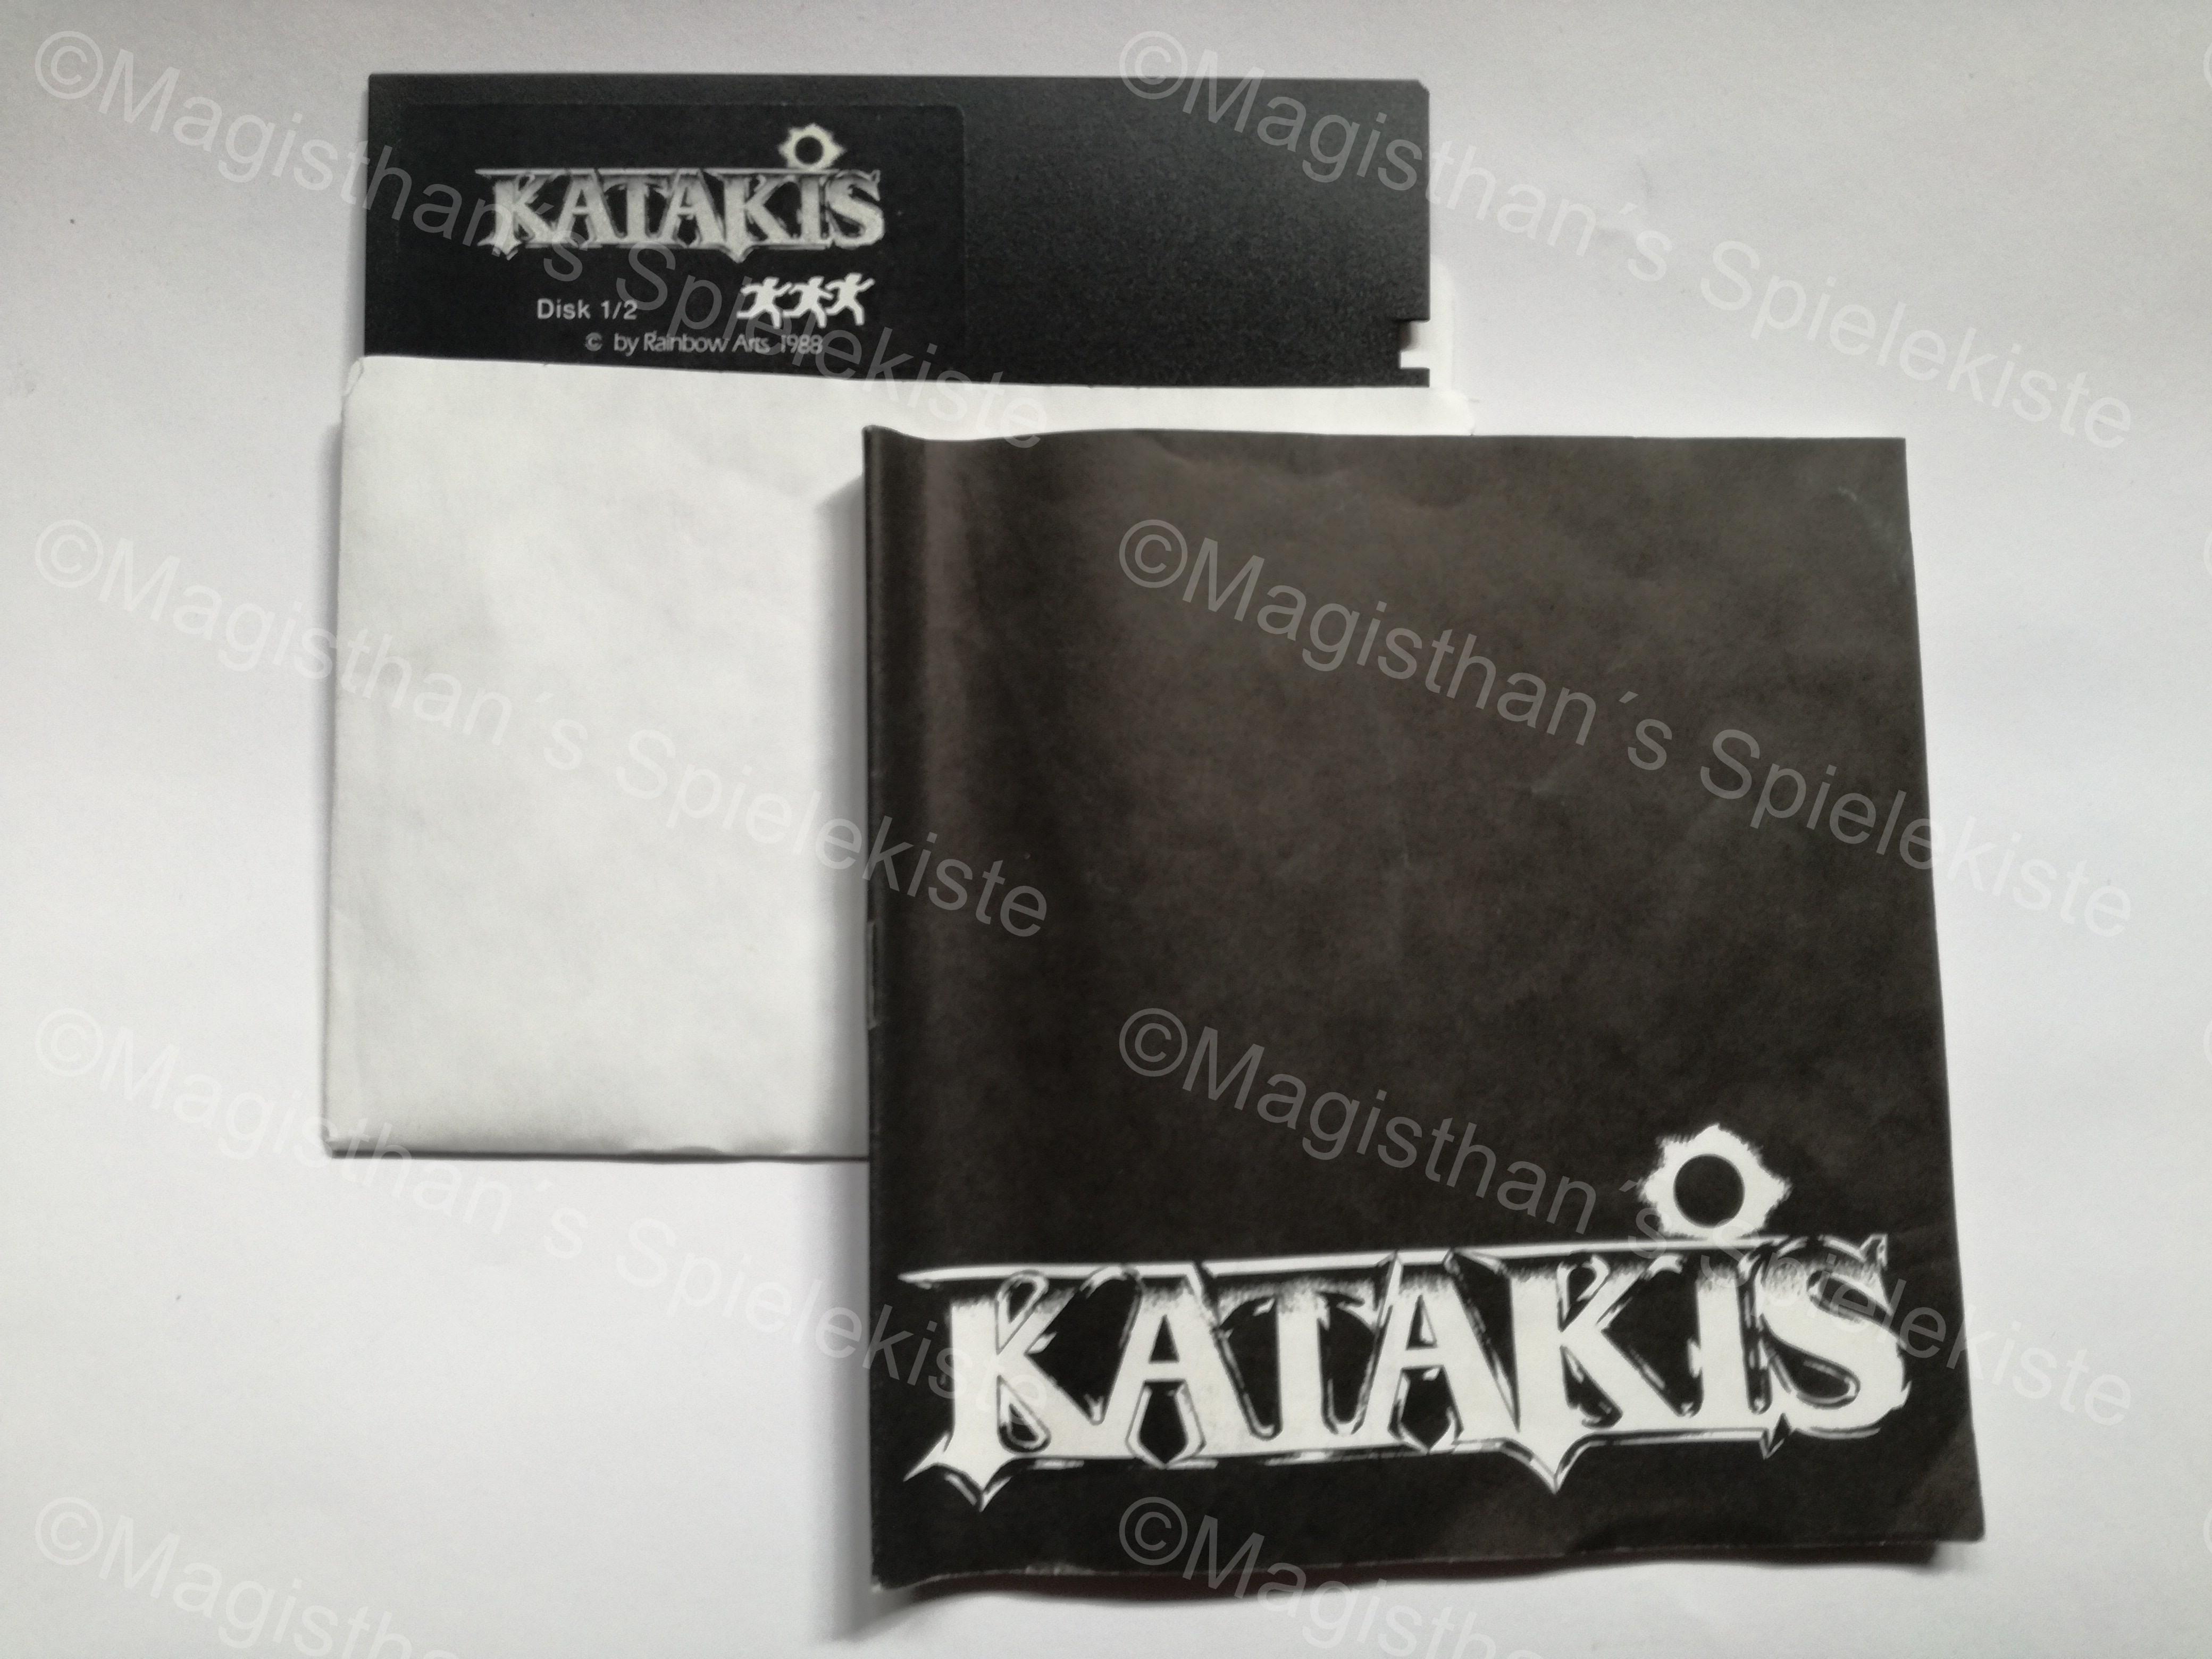 KatakisC64_2.jpg